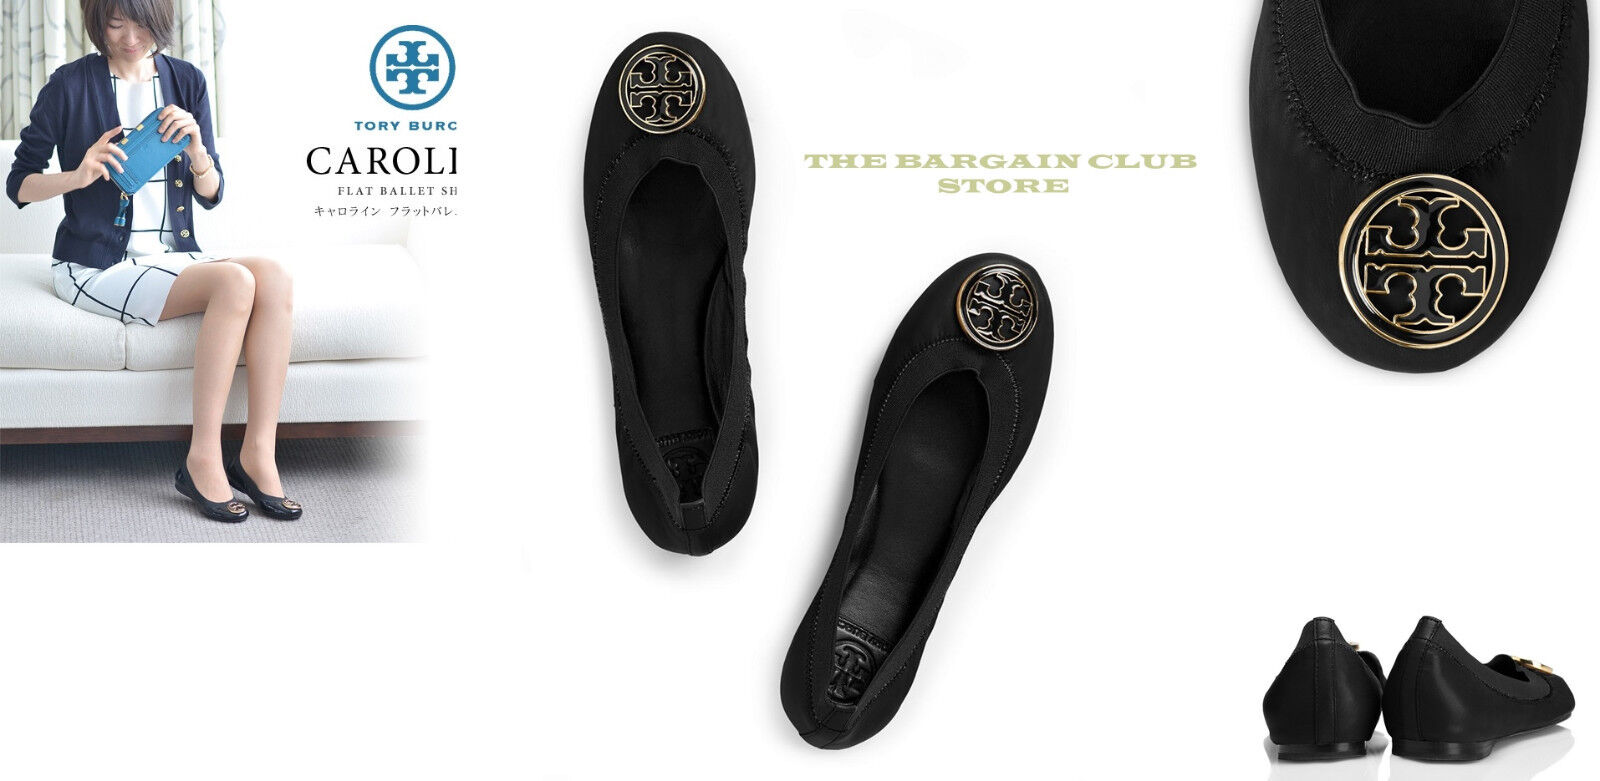 Tory Burch Chaussures Femmes Caroline Ballerines Ballet Plates Chaussures en cuir 5 m, 9 m